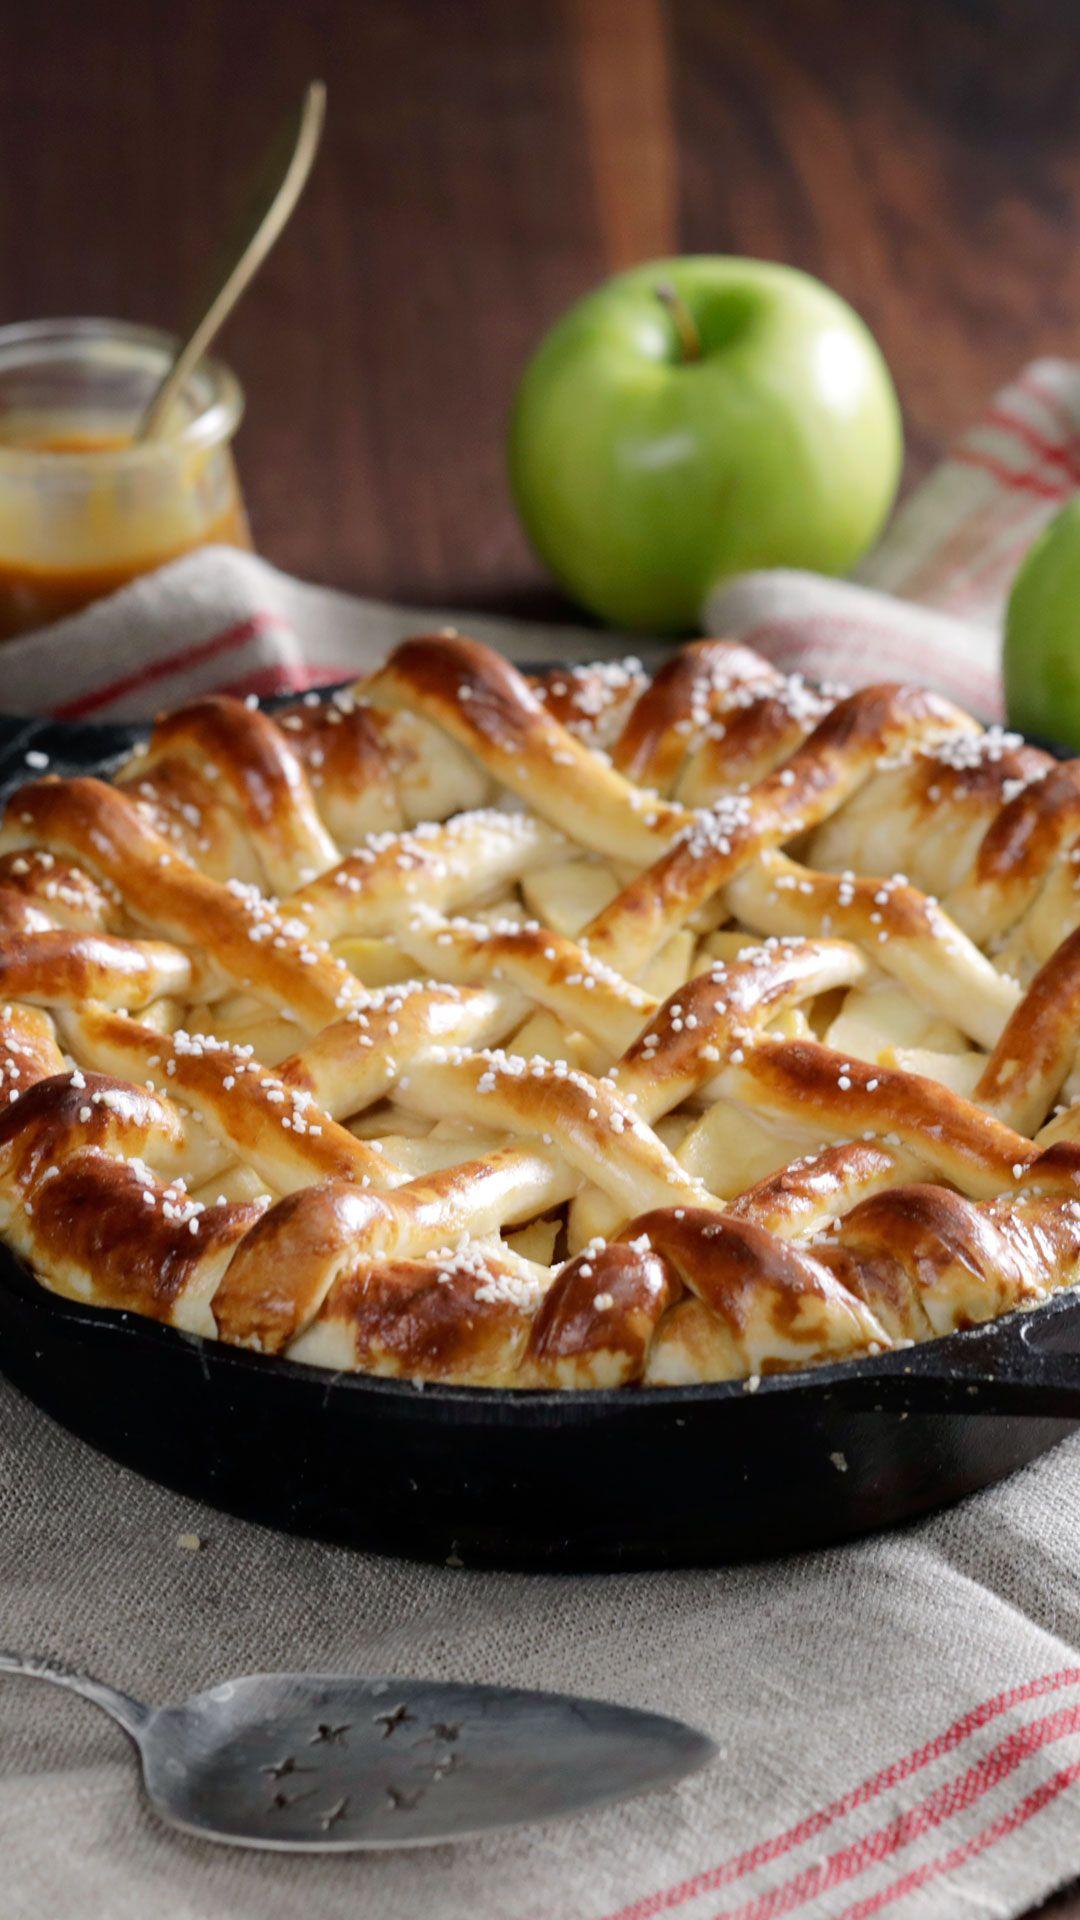 Caramel Apple Pretzel Pie Video Recipe Video Pretzel Pie Recipes Apple Pretzels